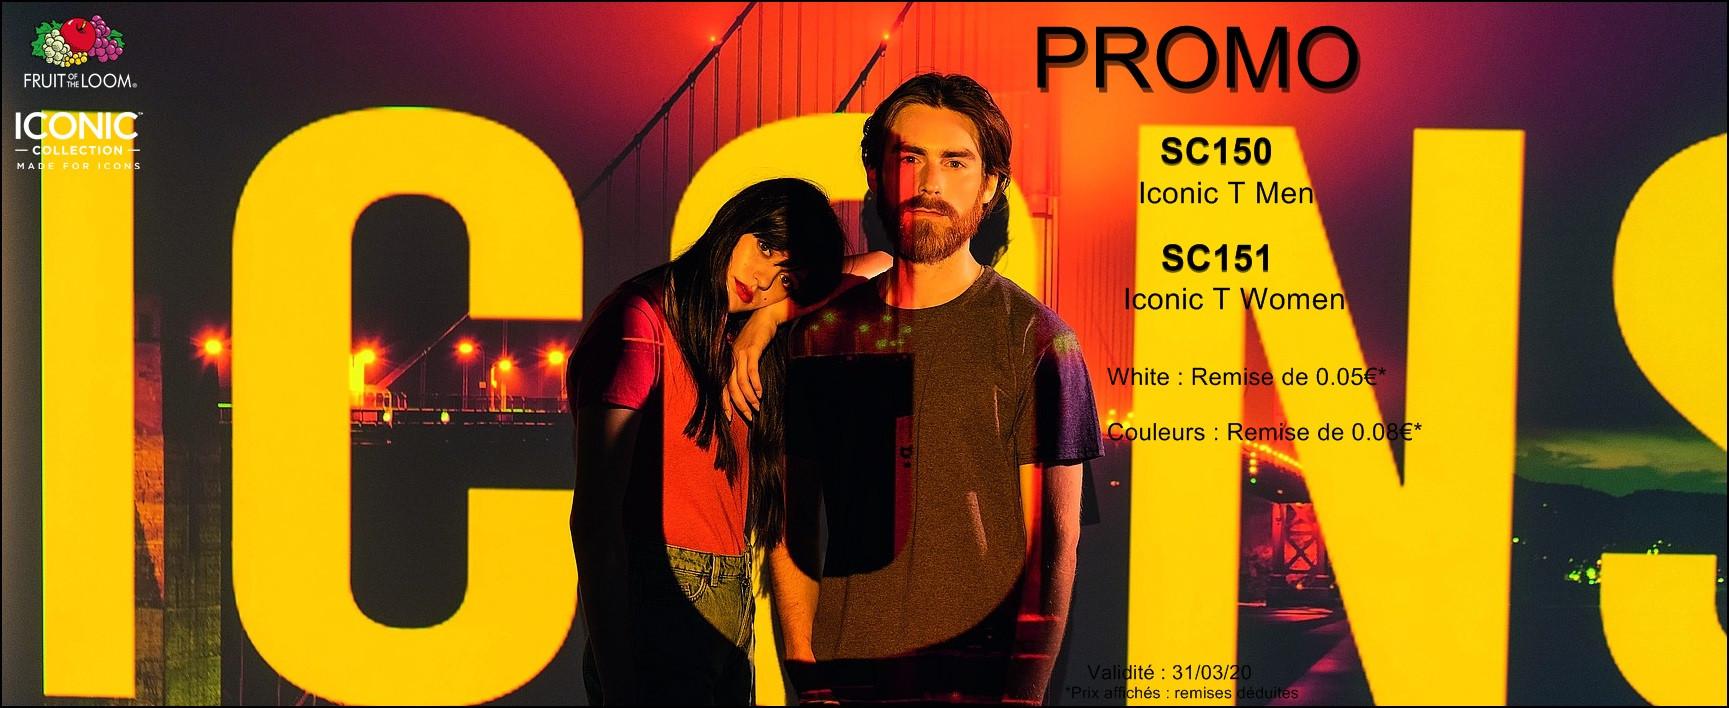 Promo SC150-SC151